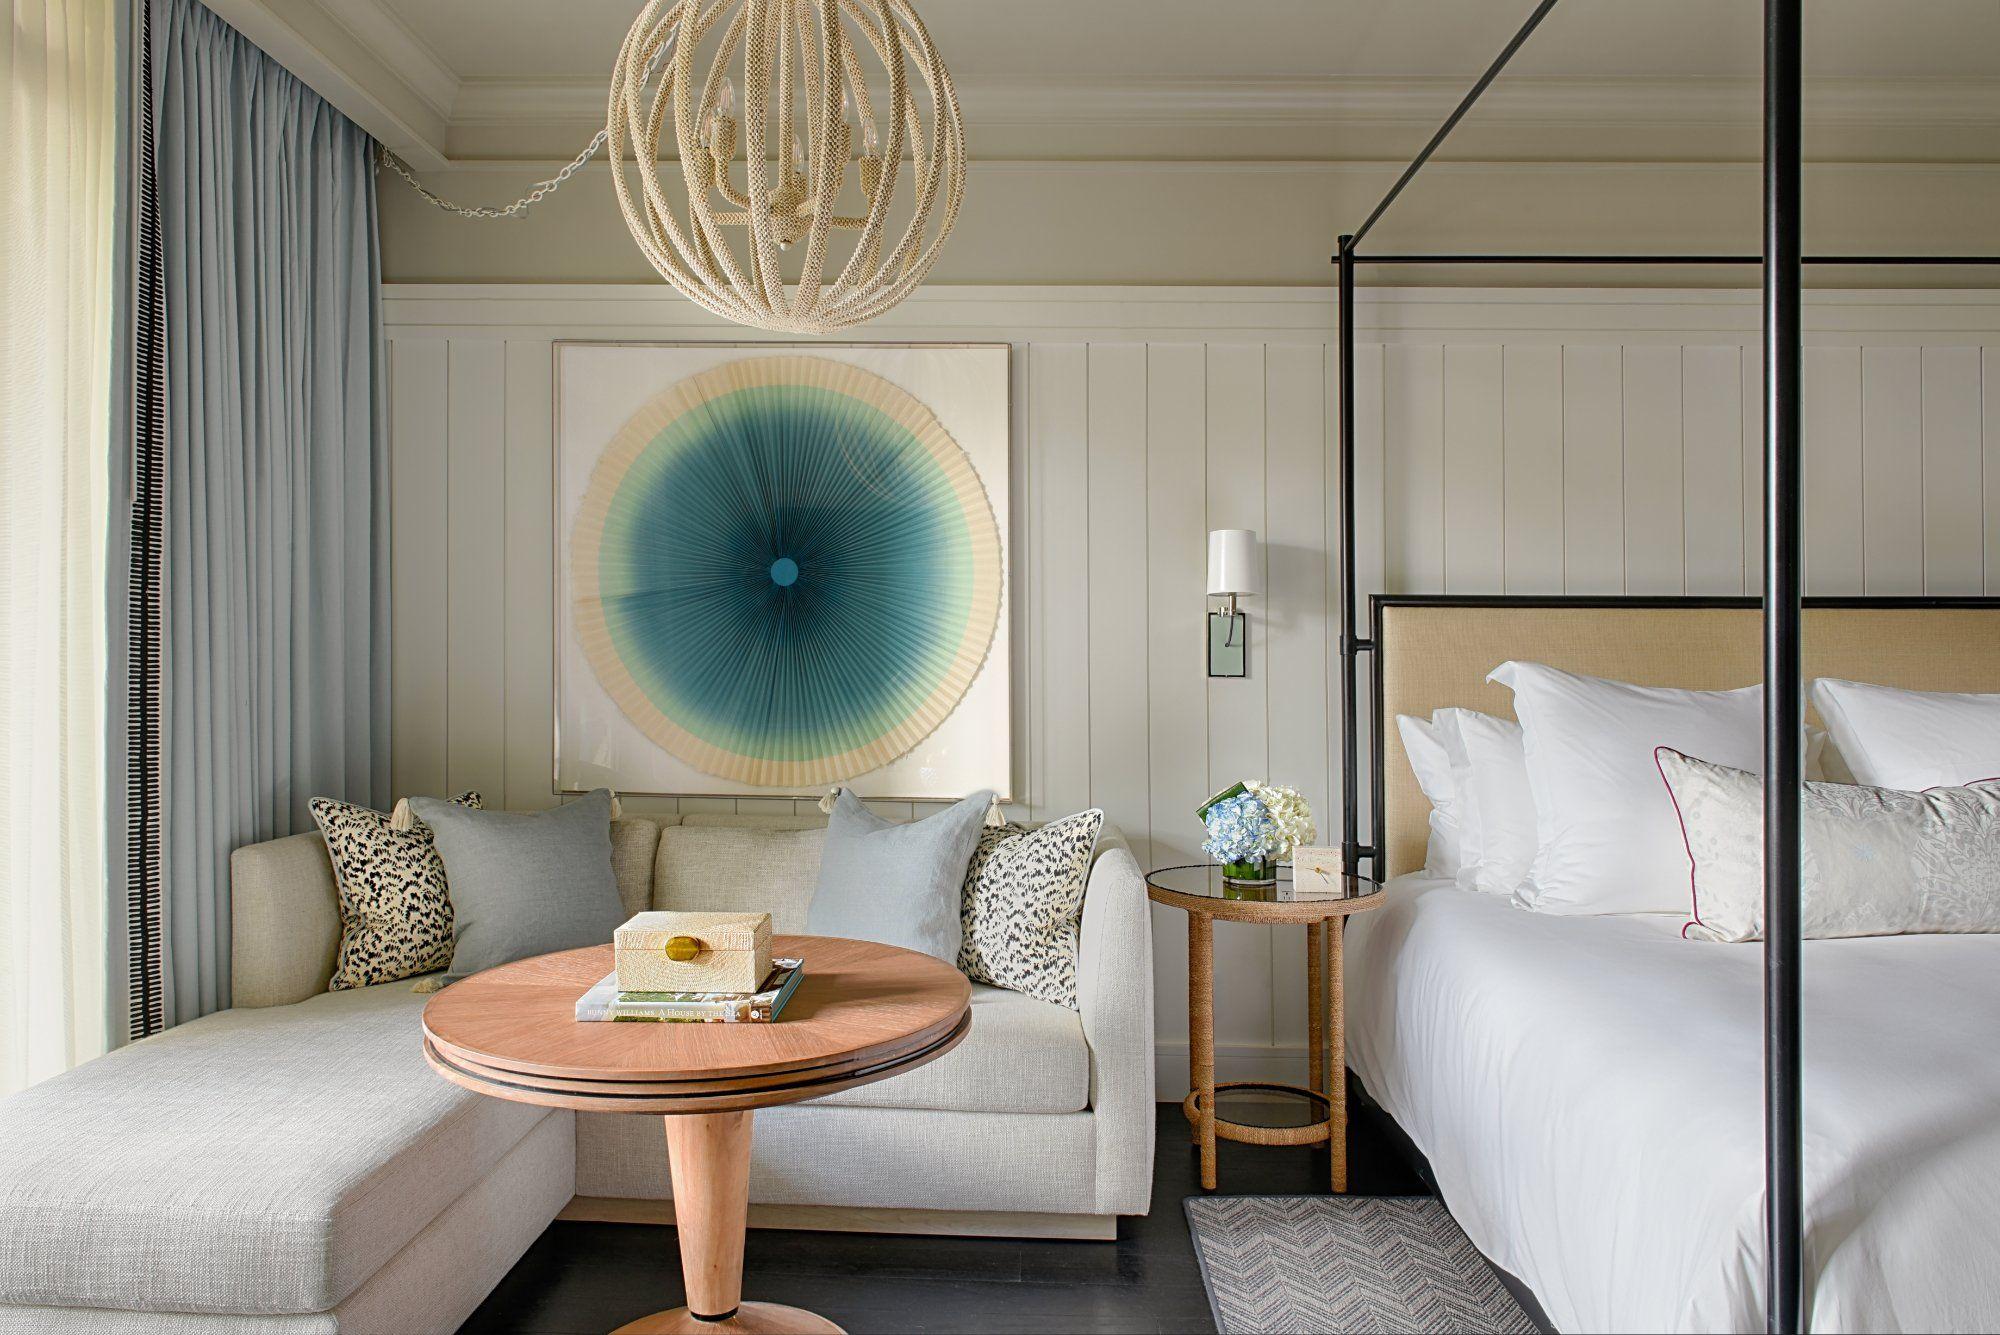 Rosewood Baha Mar Updated 2018 Resort Reviews Price Comparison And 21 Photos Nassau Bahamas Tripadvisor Rosewood Hotel Romantic Hotel Rooms Home Decor